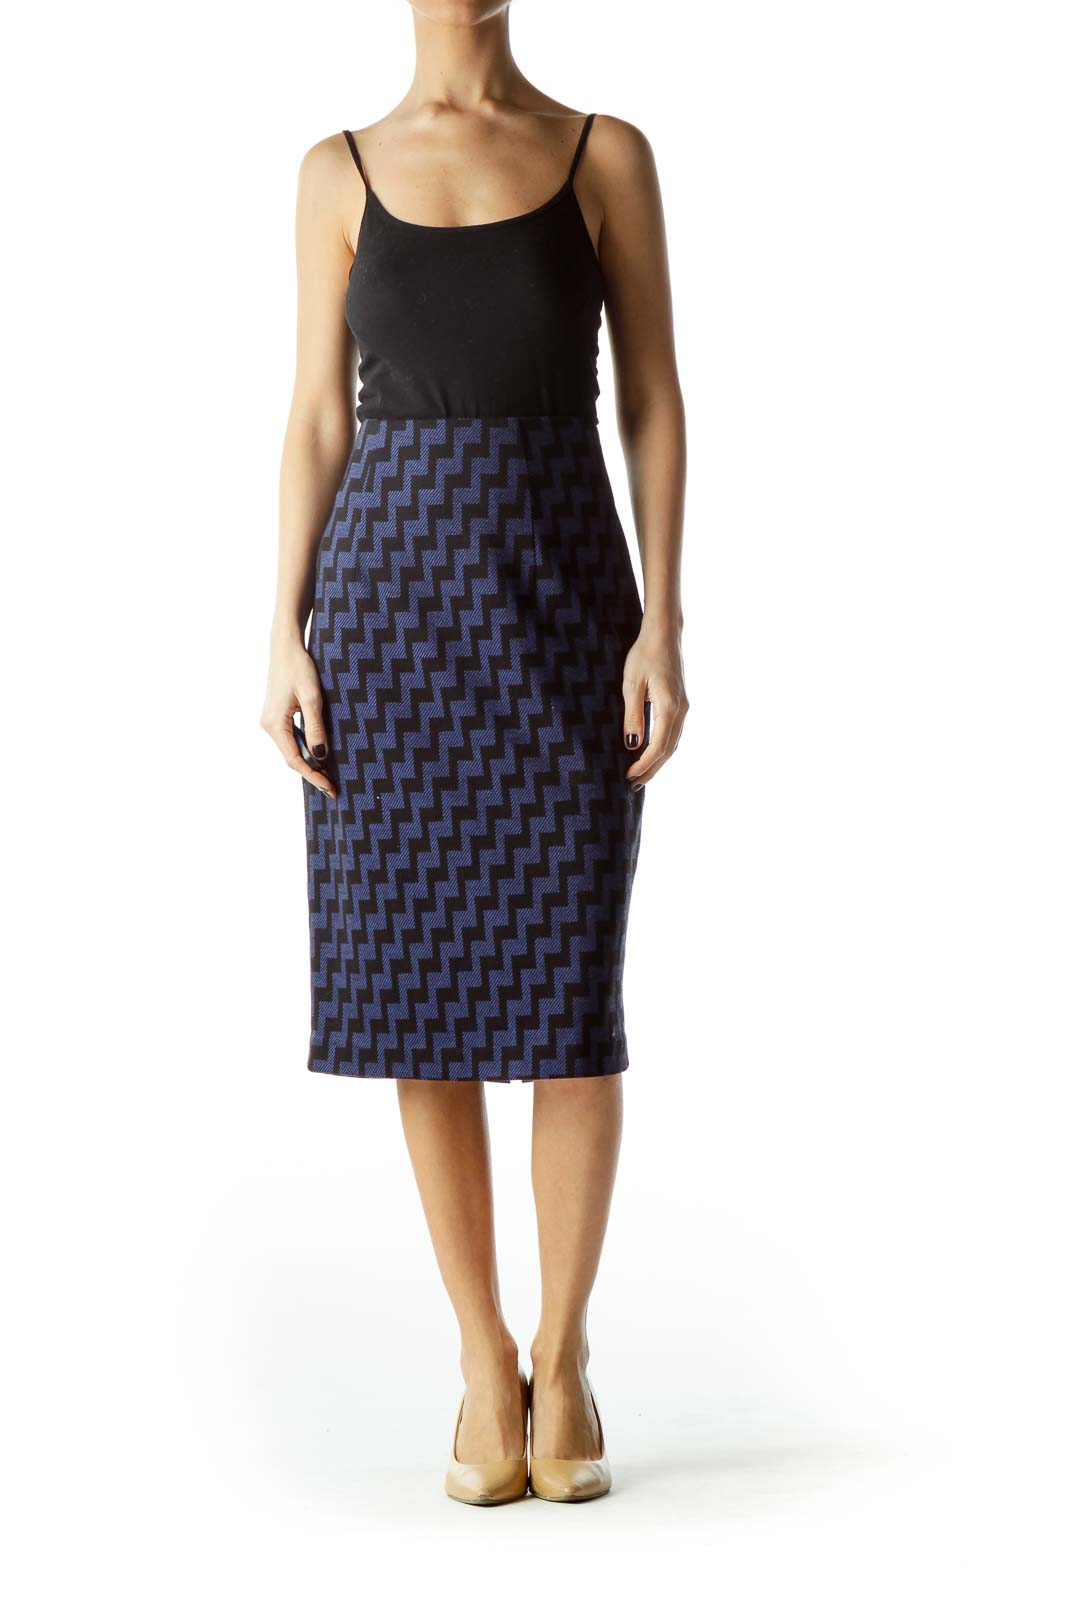 Black Blue Geometric Print Midi Pencil Knit Skirt